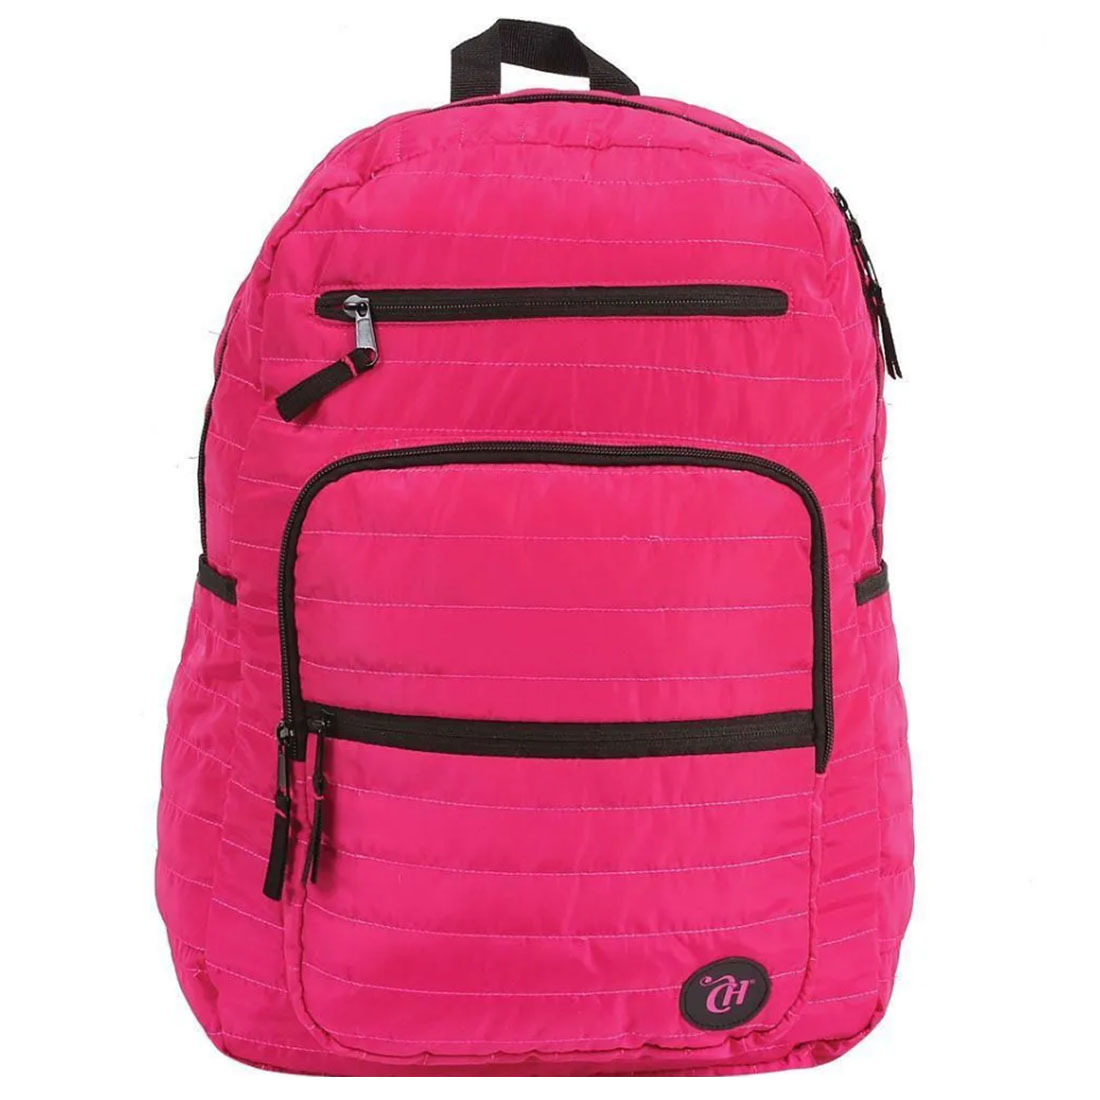 Mochila Capricho Puff Pink 48943